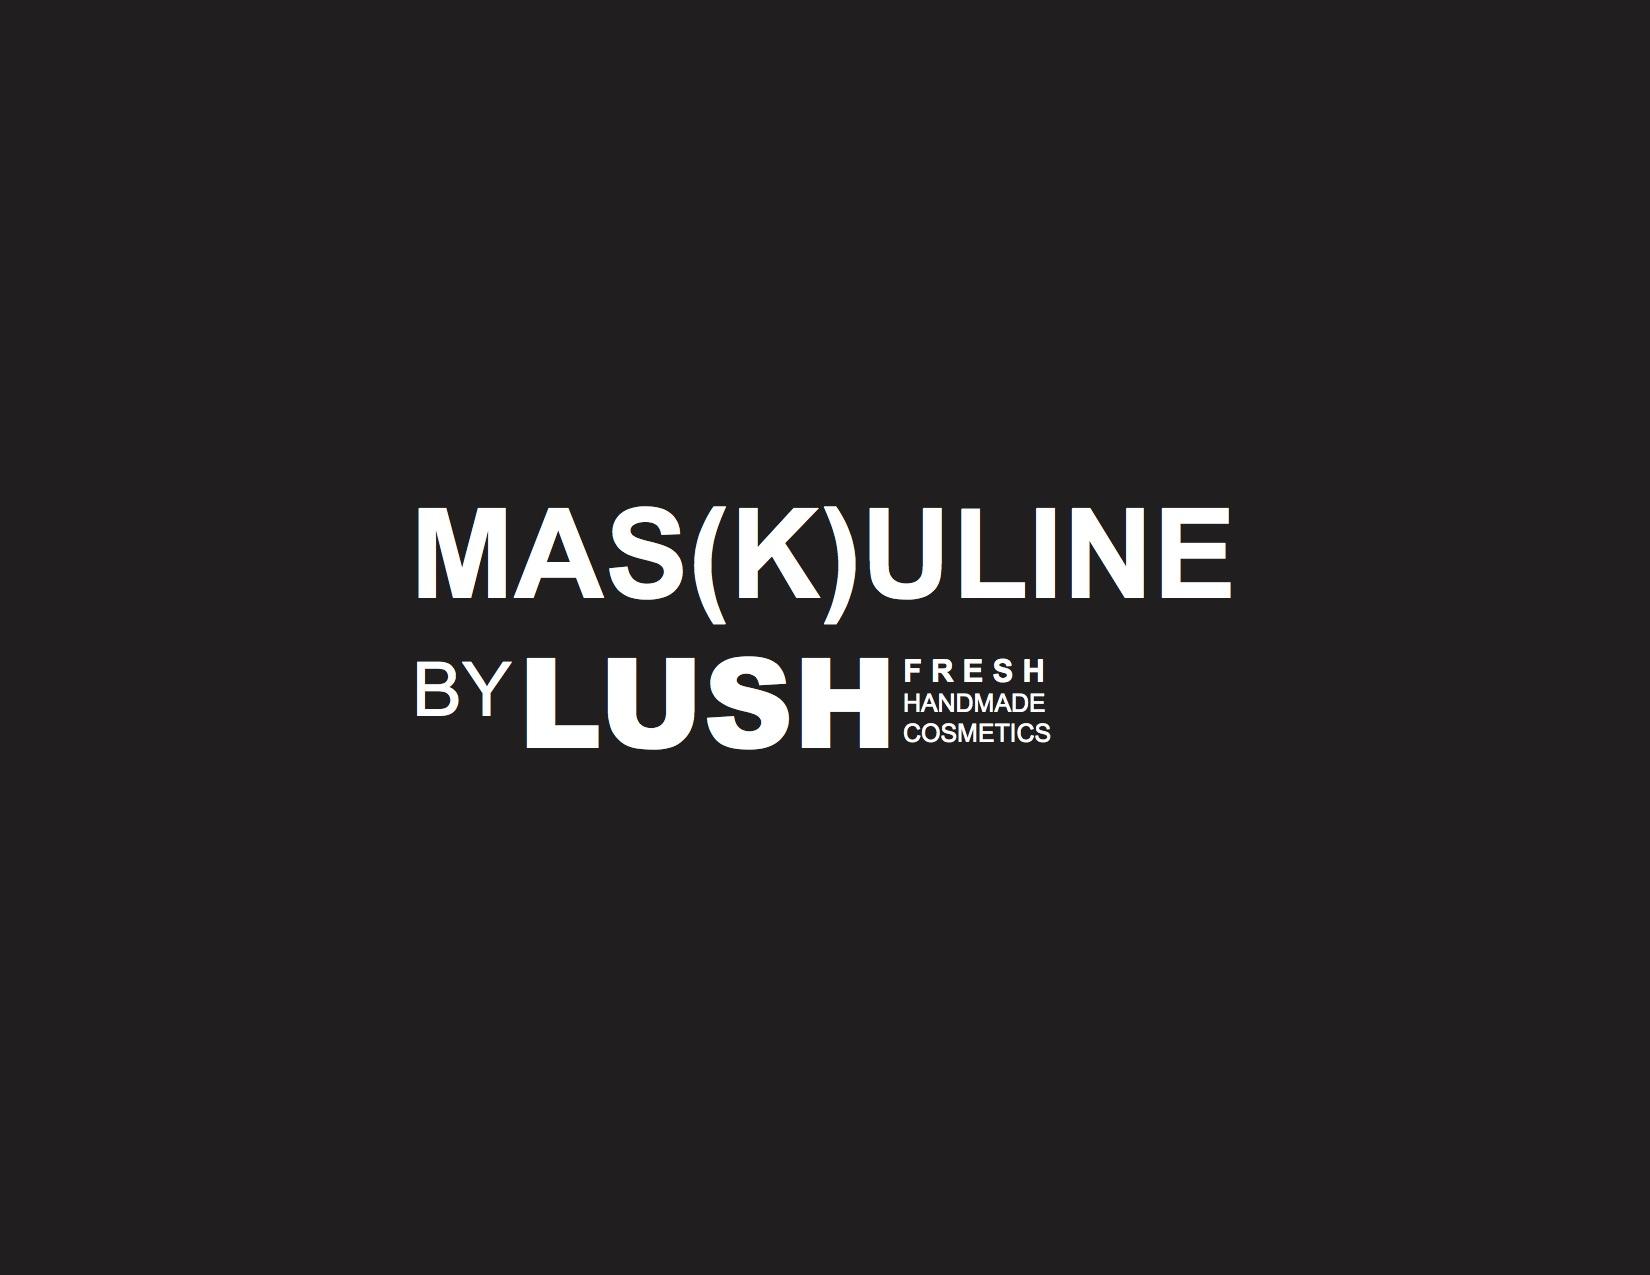 Mas(k)uline_J460+(1)+(dragged).jpg